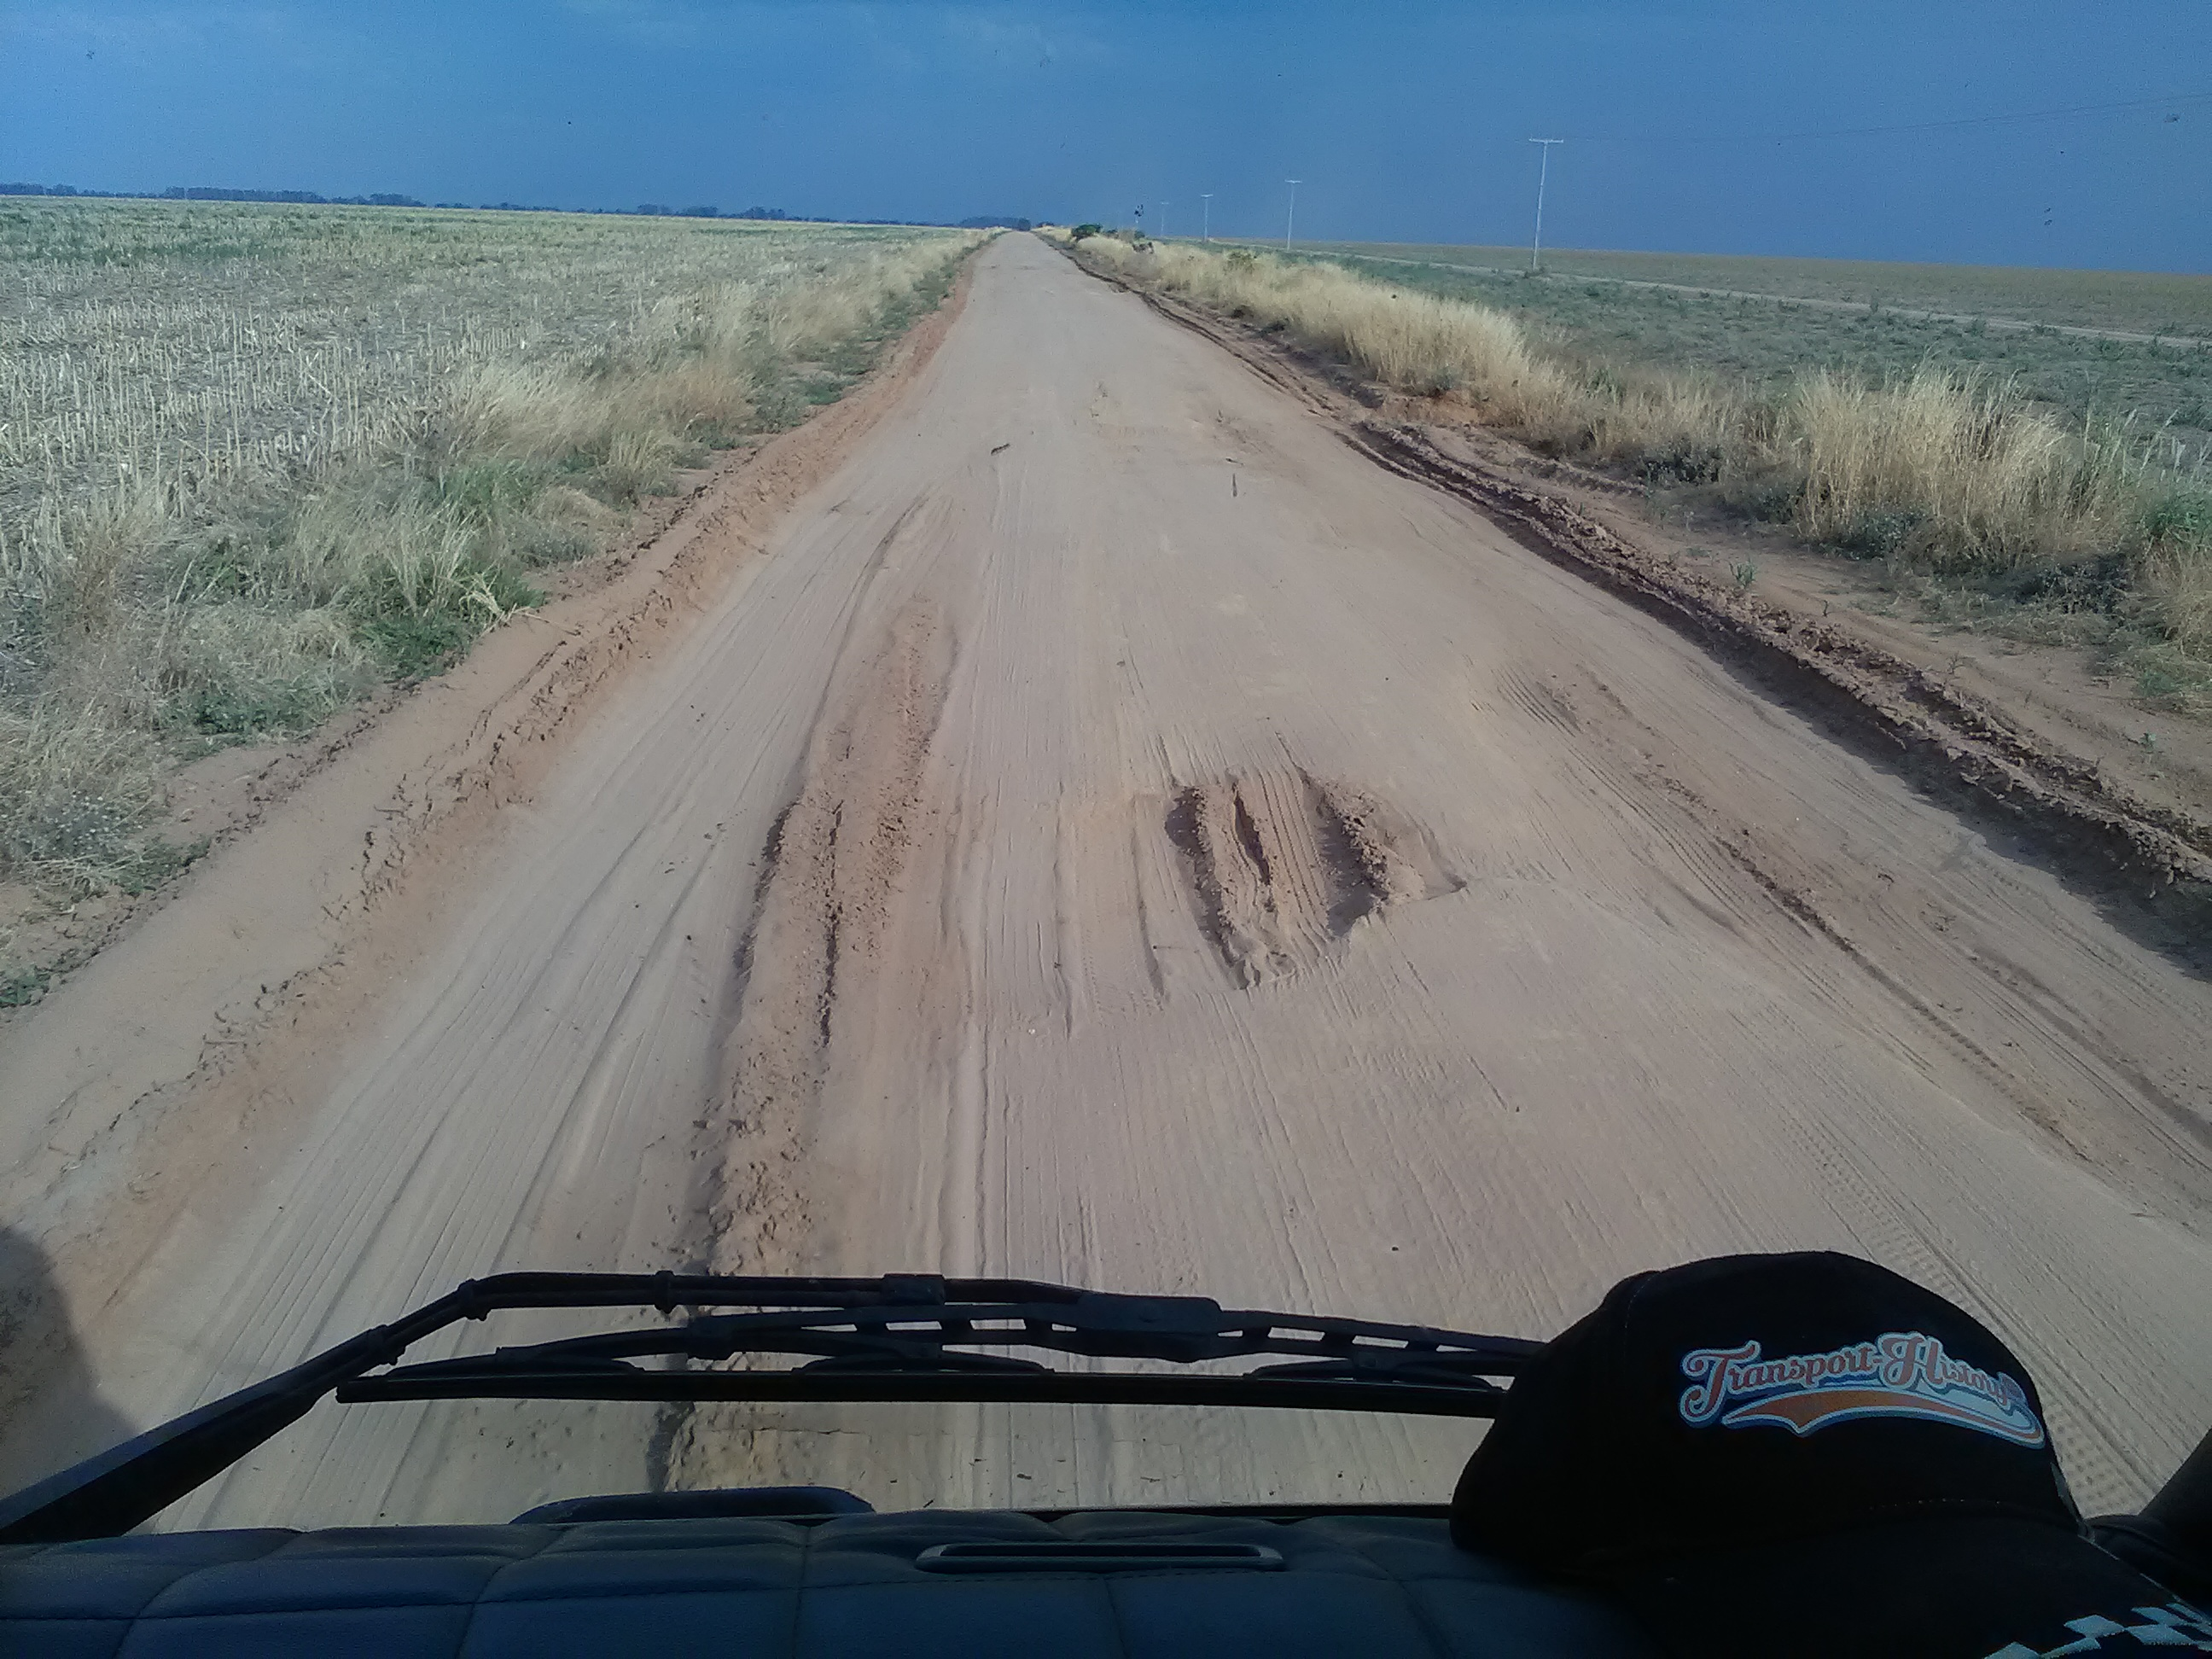 Dit-is-de-weg.-soms-tot-minder-dan-5-Km-per-uur--59